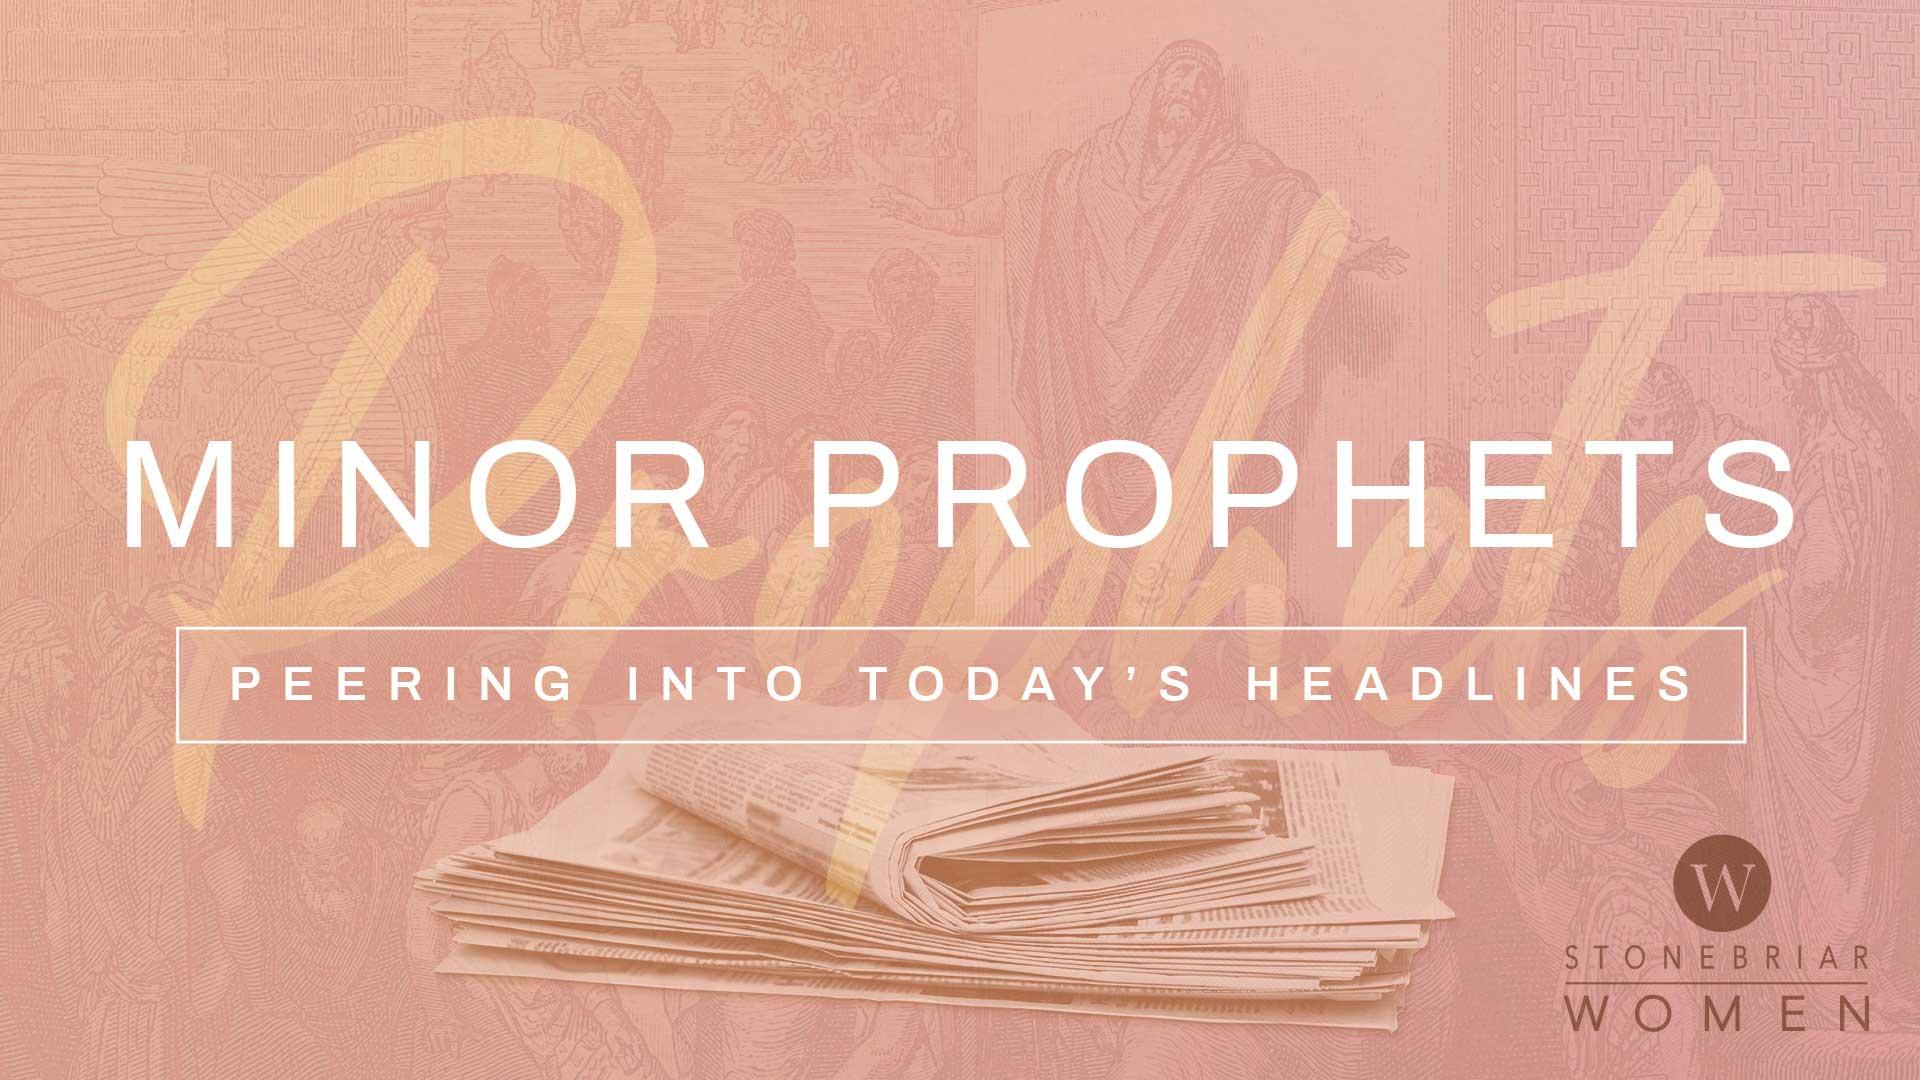 Women's Bible Study of the Minor Prophets